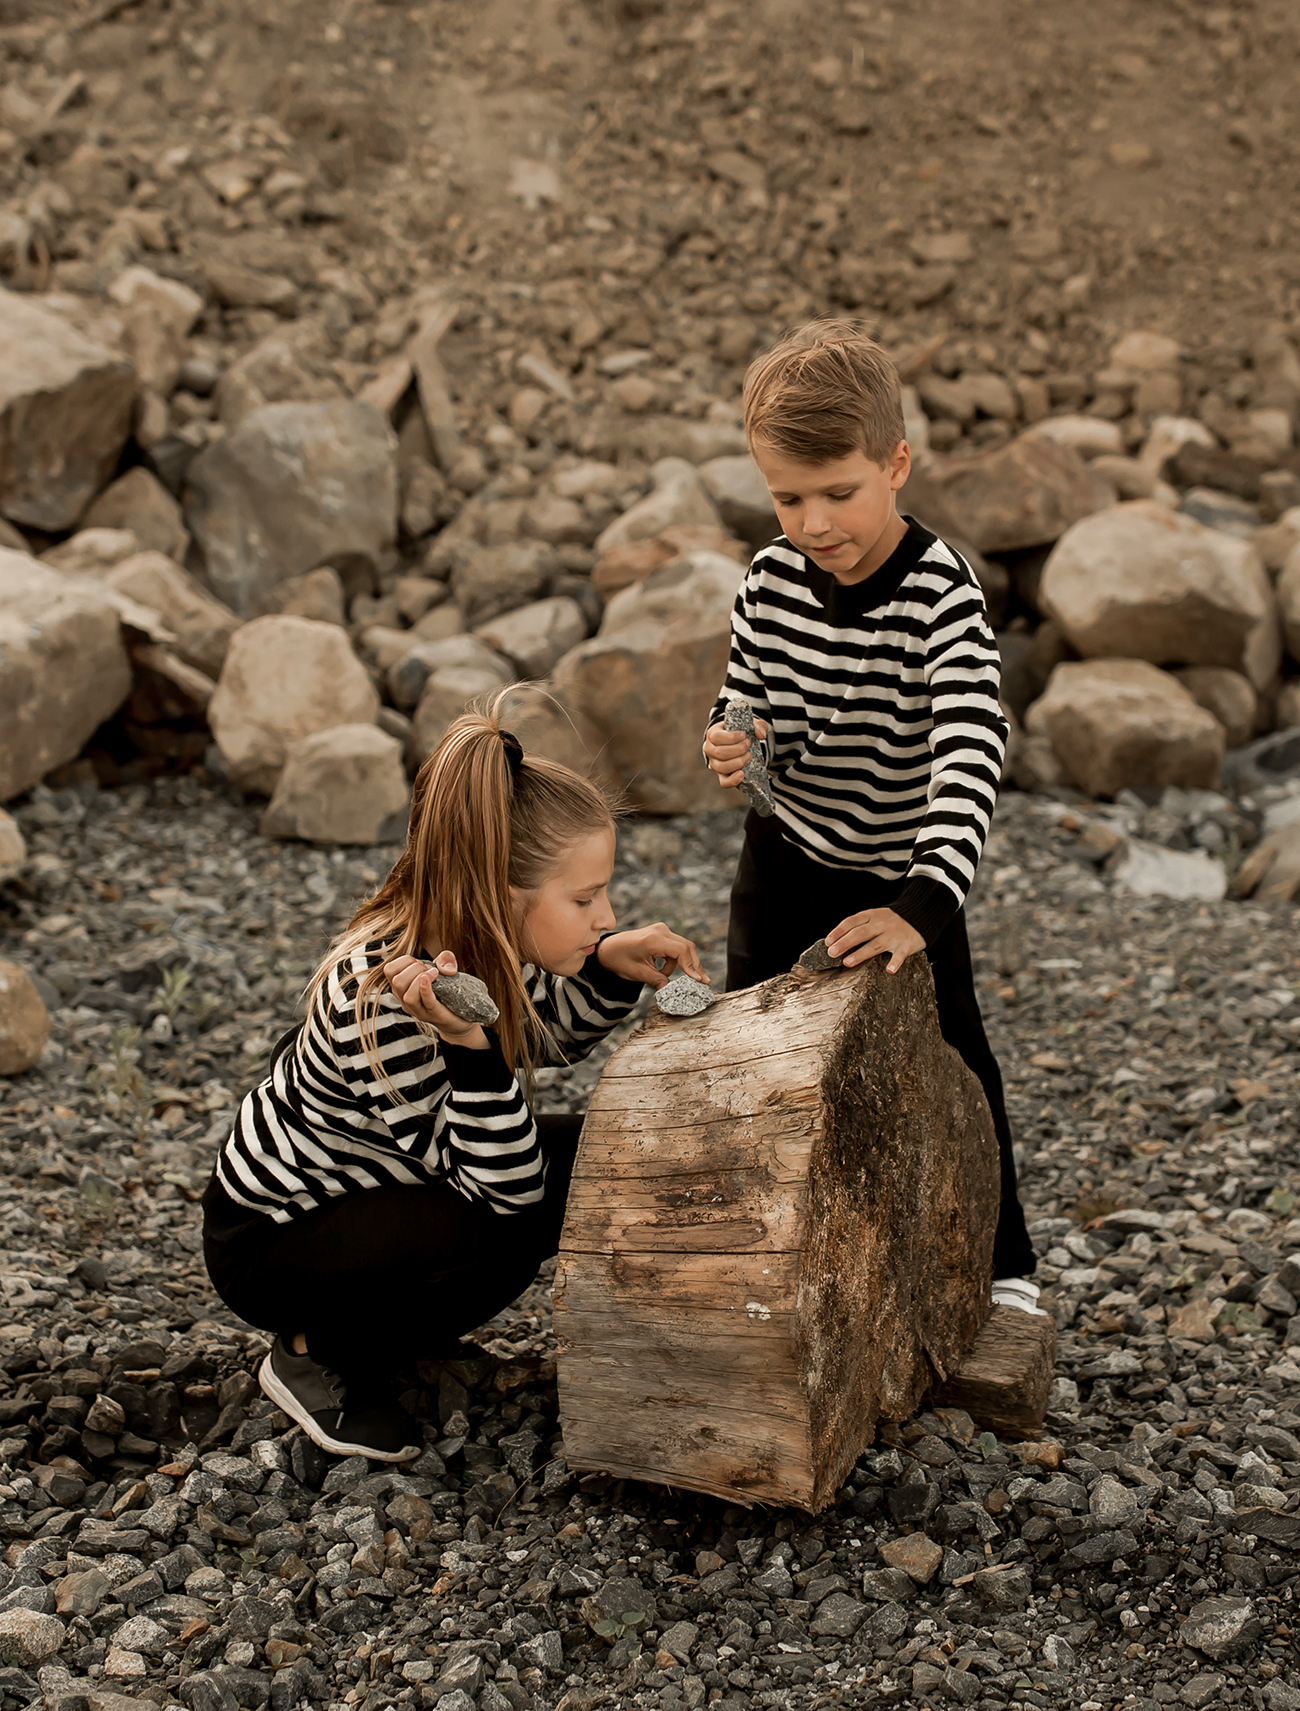 pierre robert lapset